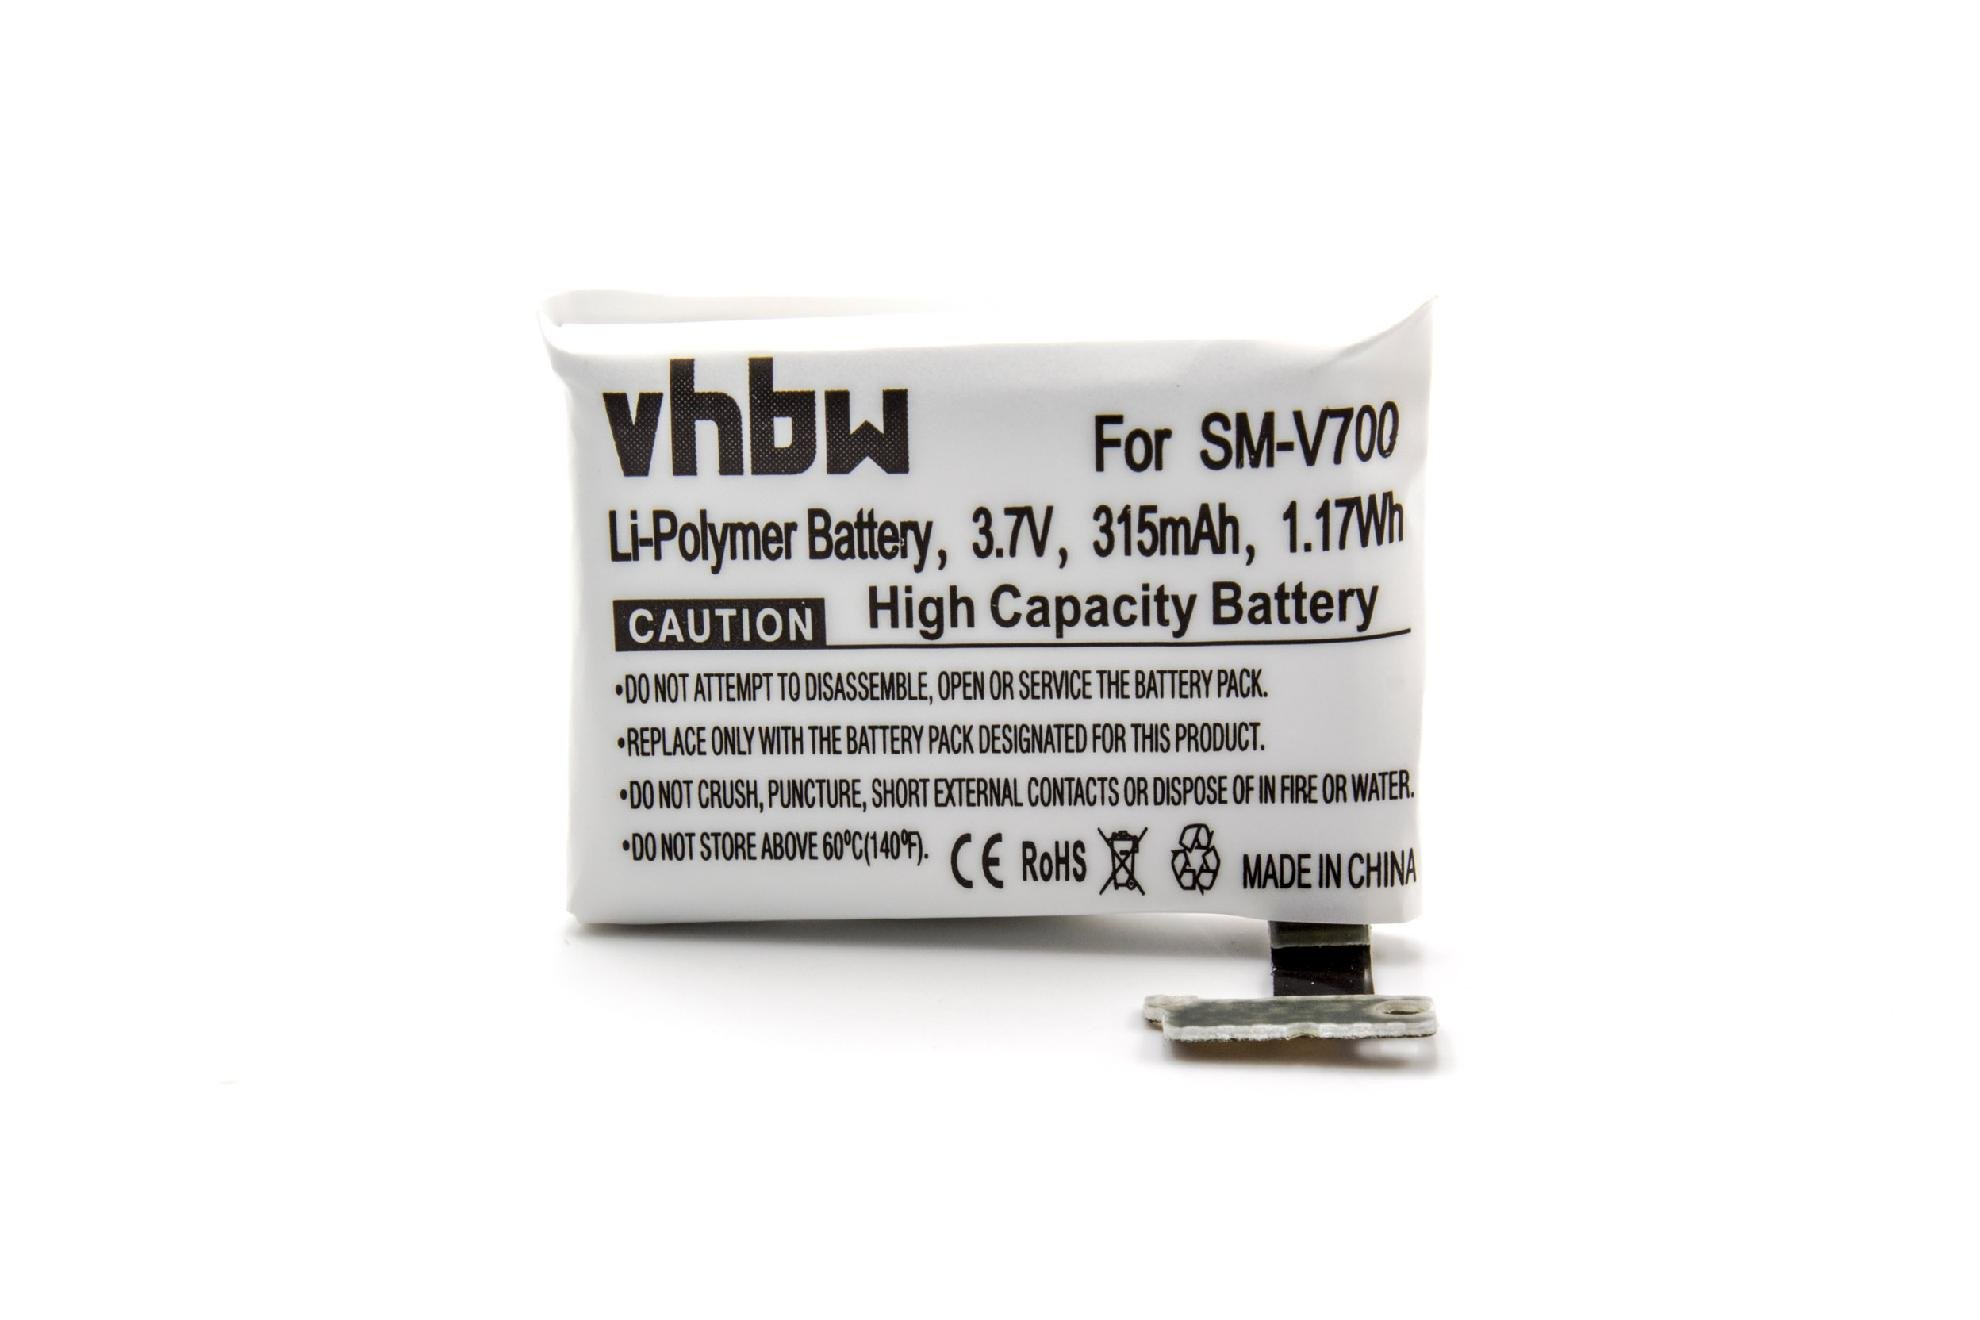 CELLONIC/® Bater/ía Premium Compatible con Samsung Gear 1 V700 // SM-V700 GH43-03992A 250mAh Pila Repuesto bateria B030FE